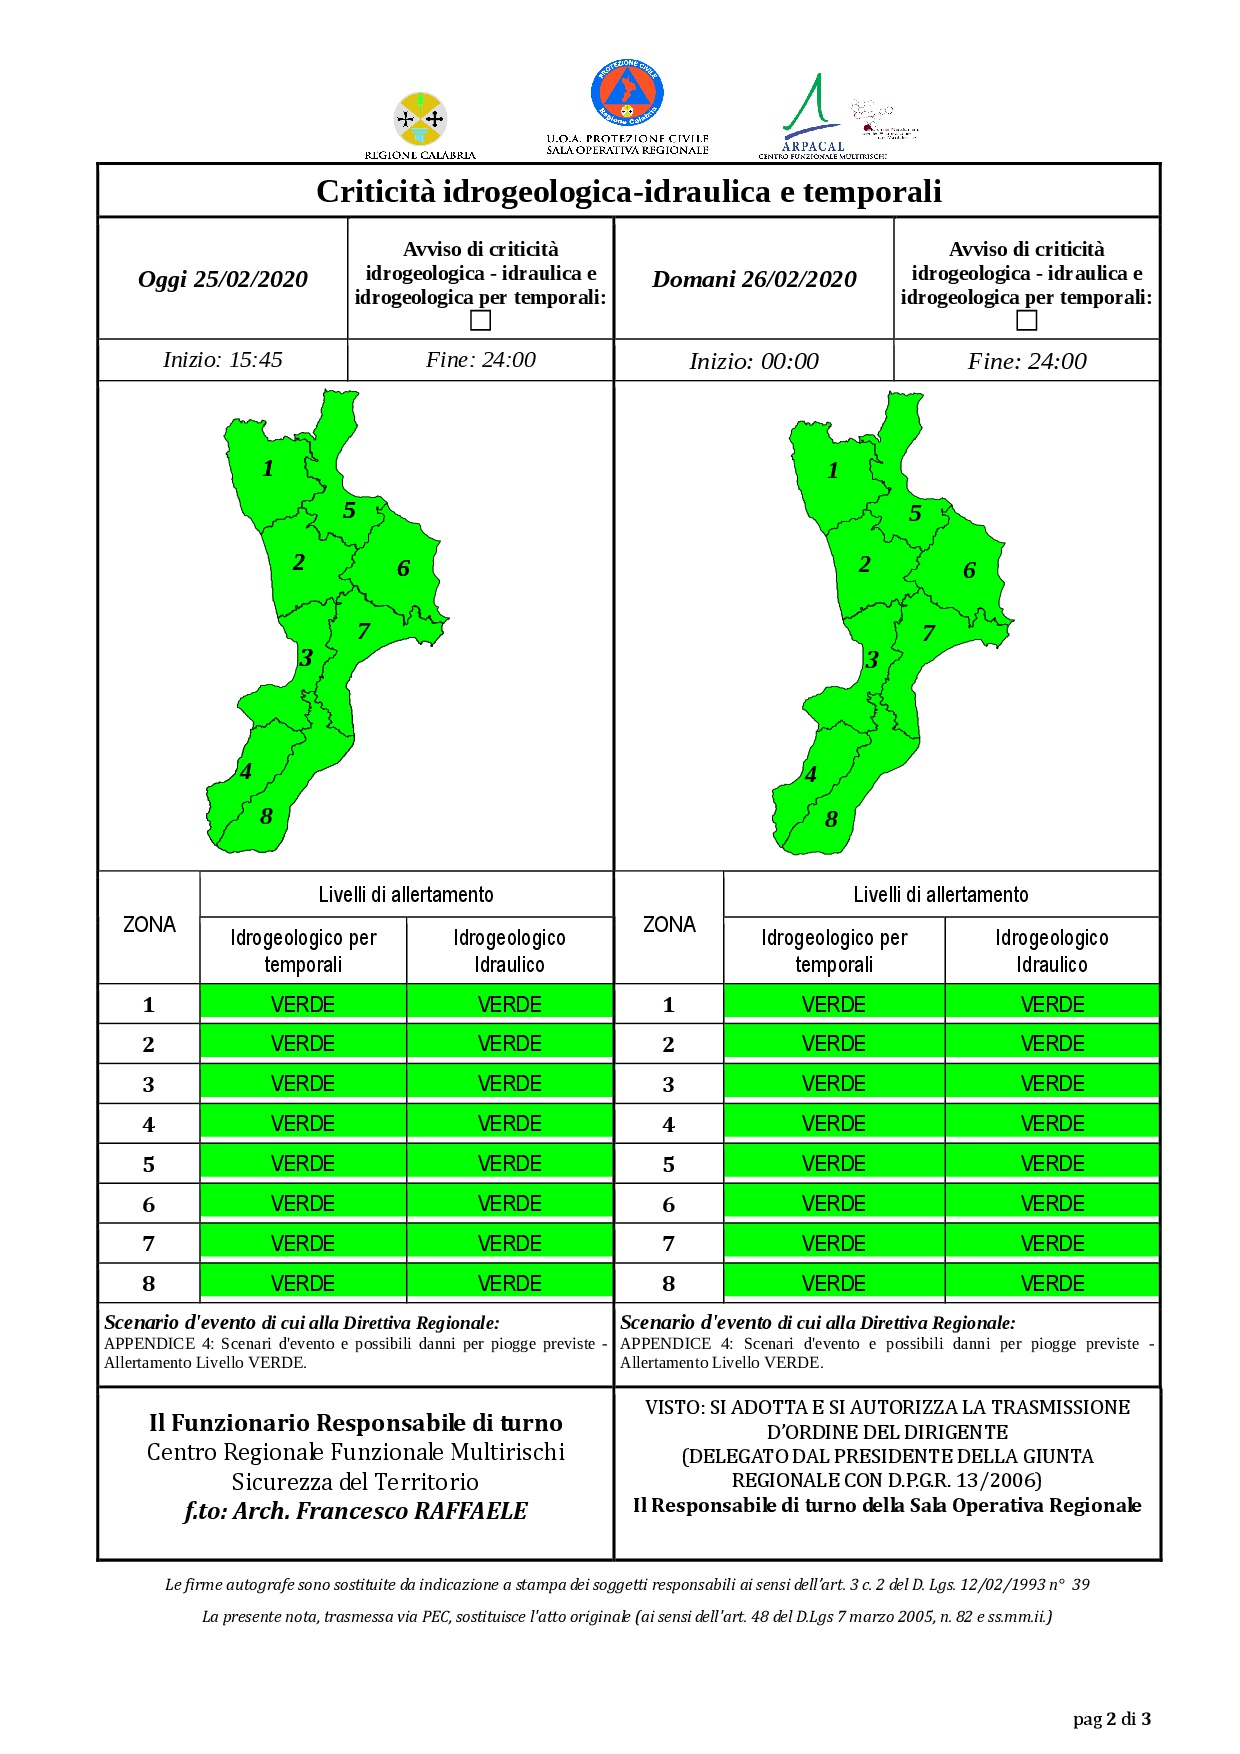 Criticità idrogeologica-idraulica e temporali in Calabria 25-02-2020